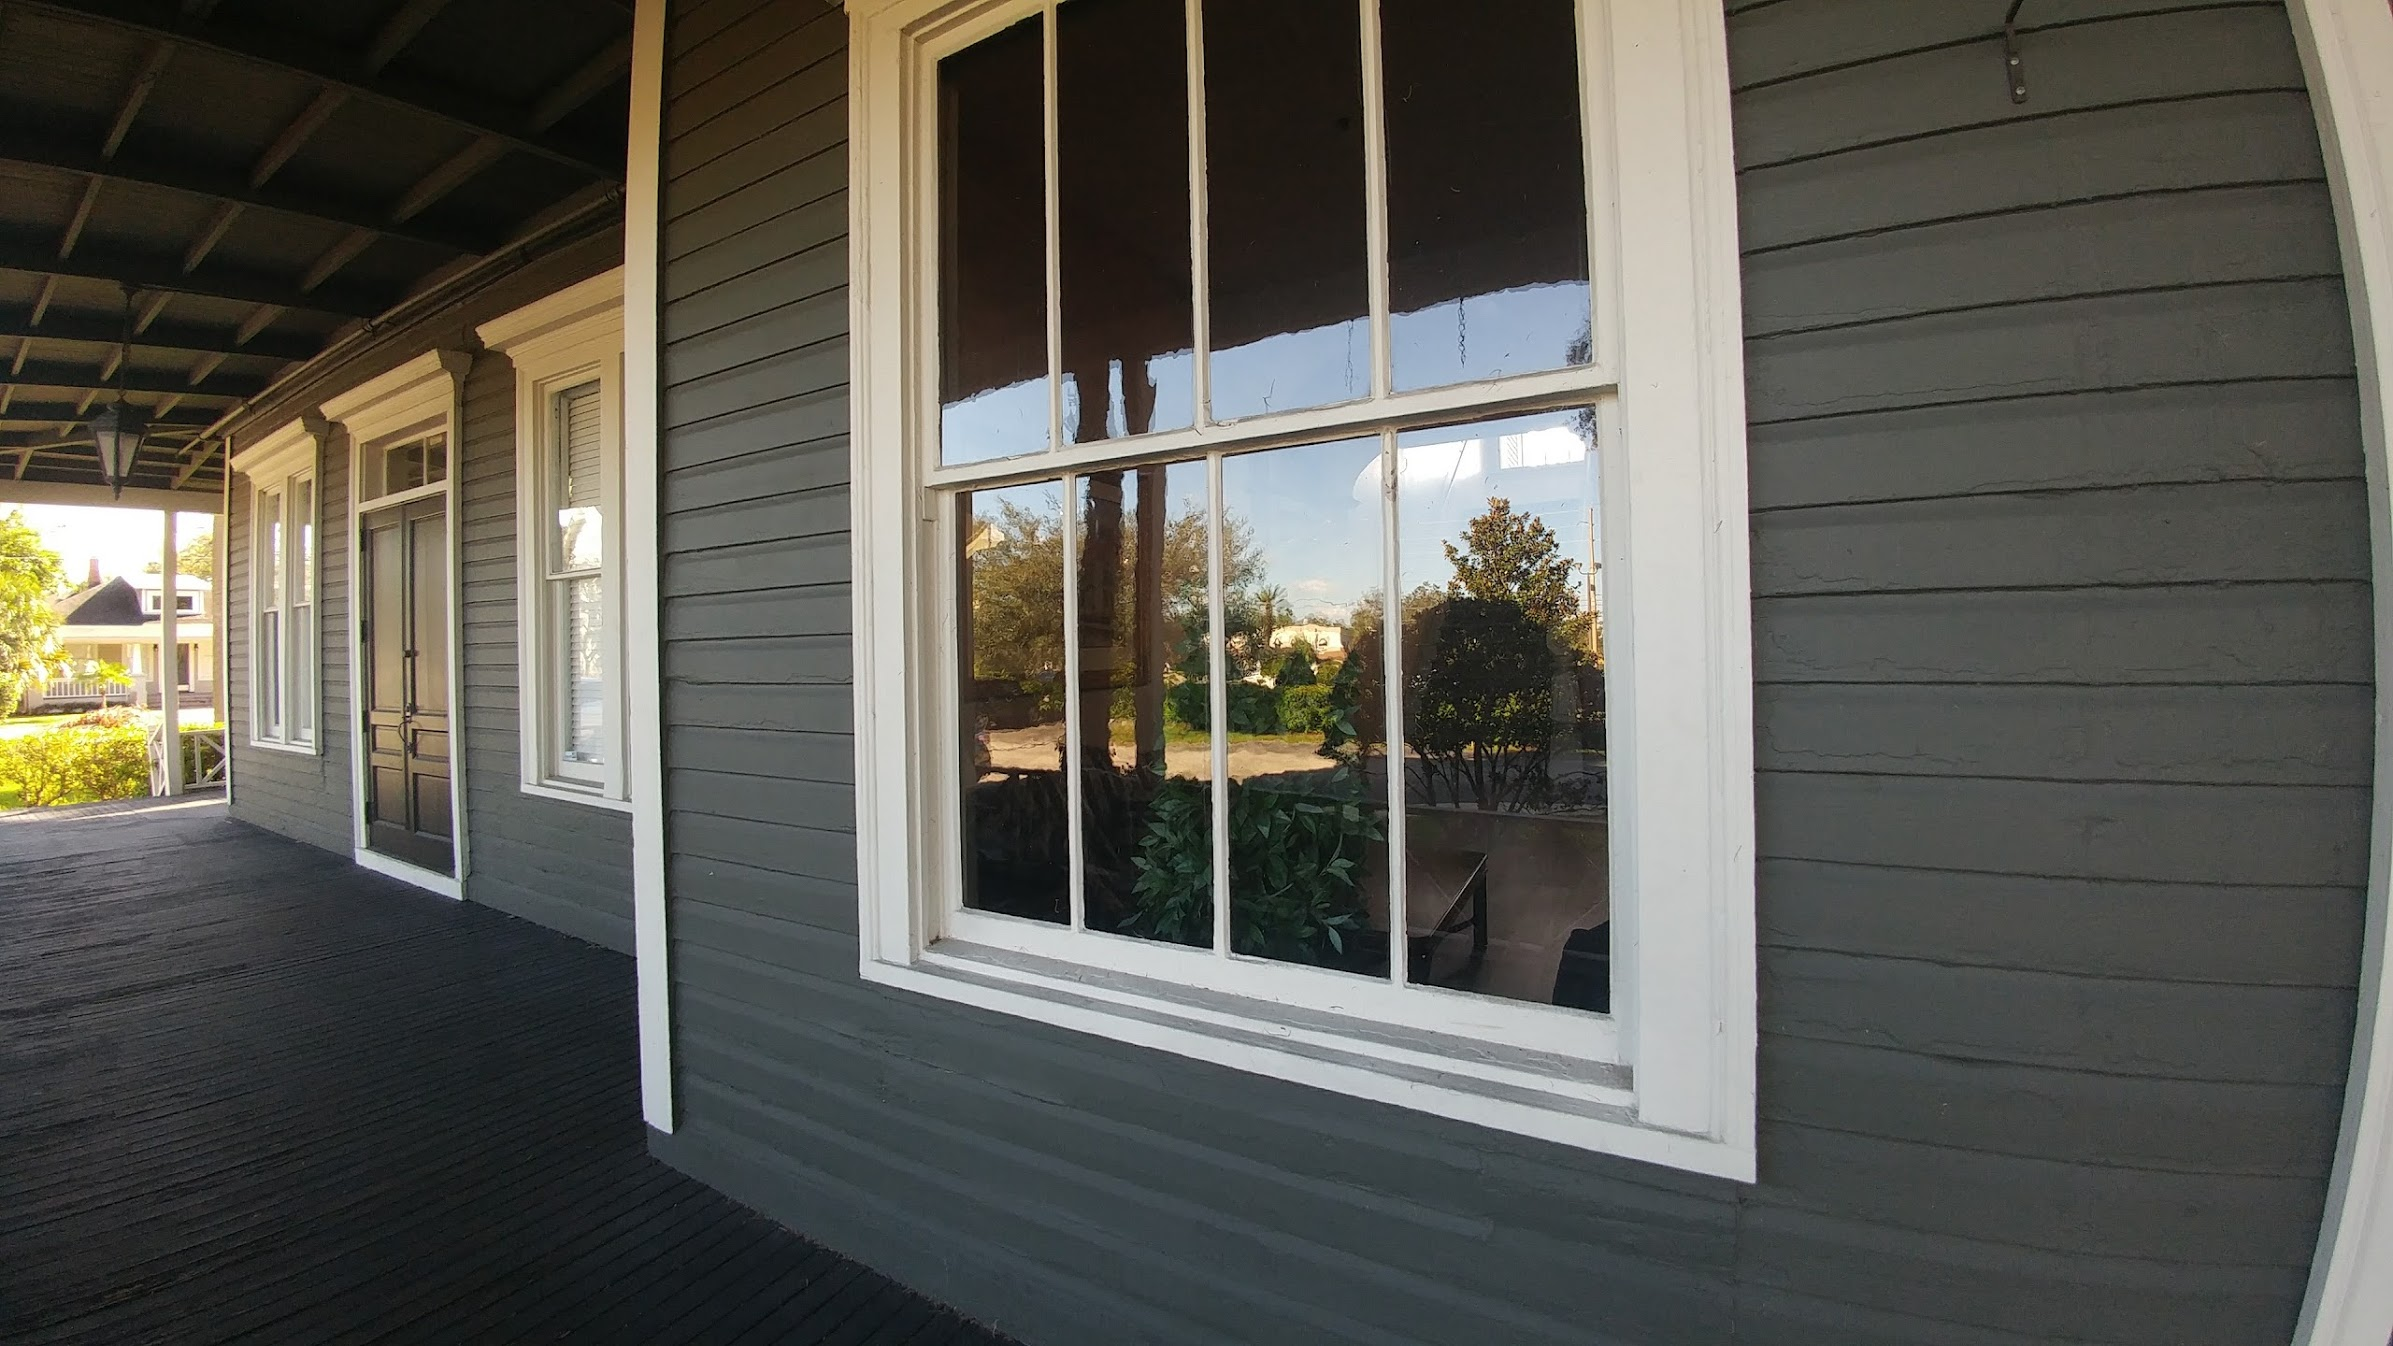 Original windows